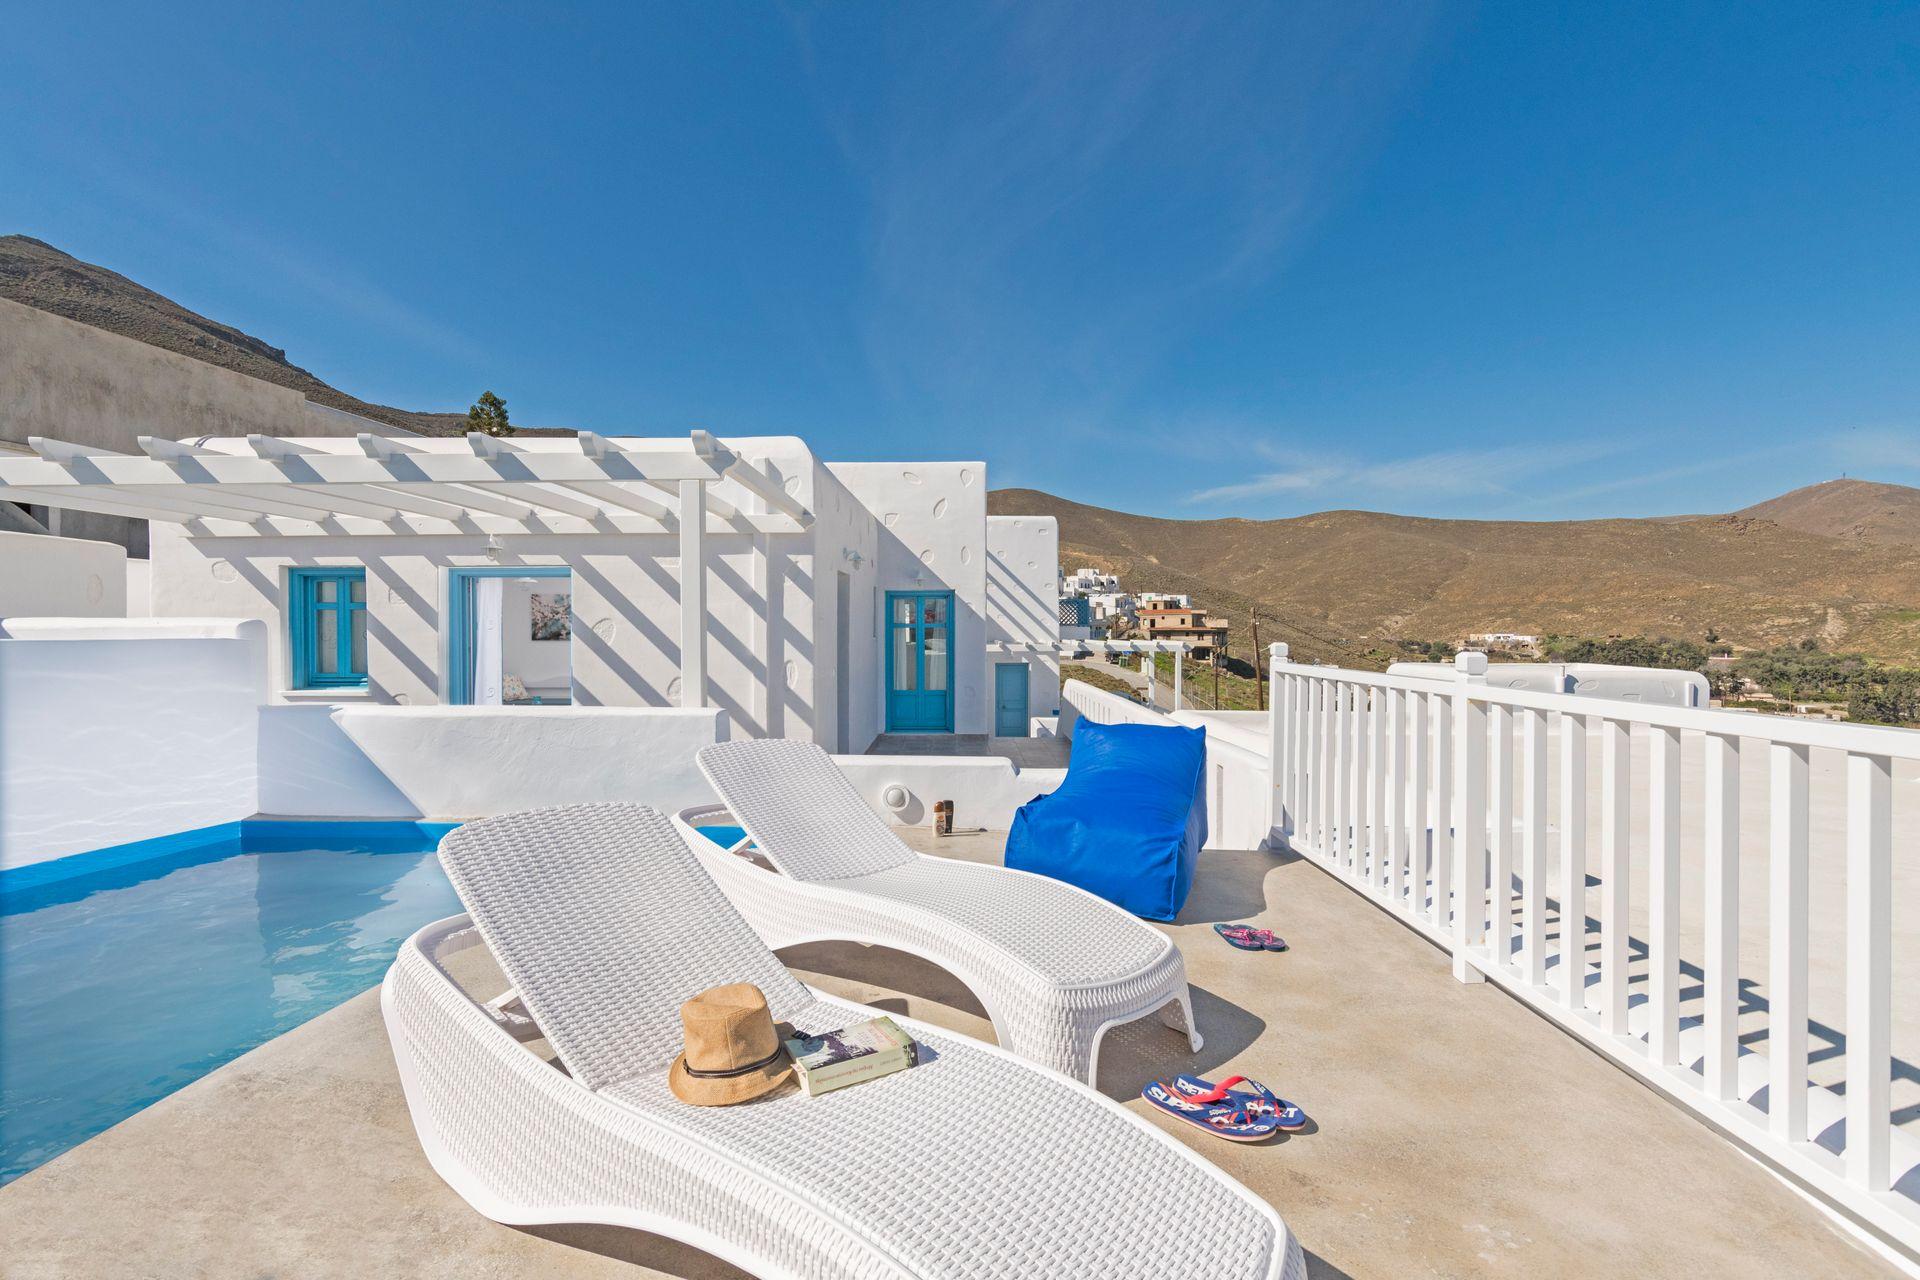 Aegean Sea Villas - Αστυπάλαια ✦ 2 Ημέρες (1 Διανυκτέρευση) ✦ 3 άτομα ✦ Χωρίς Πρωινό ✦ 01/06/2021 έως 30/06/2021 ✦ Free WiFi!